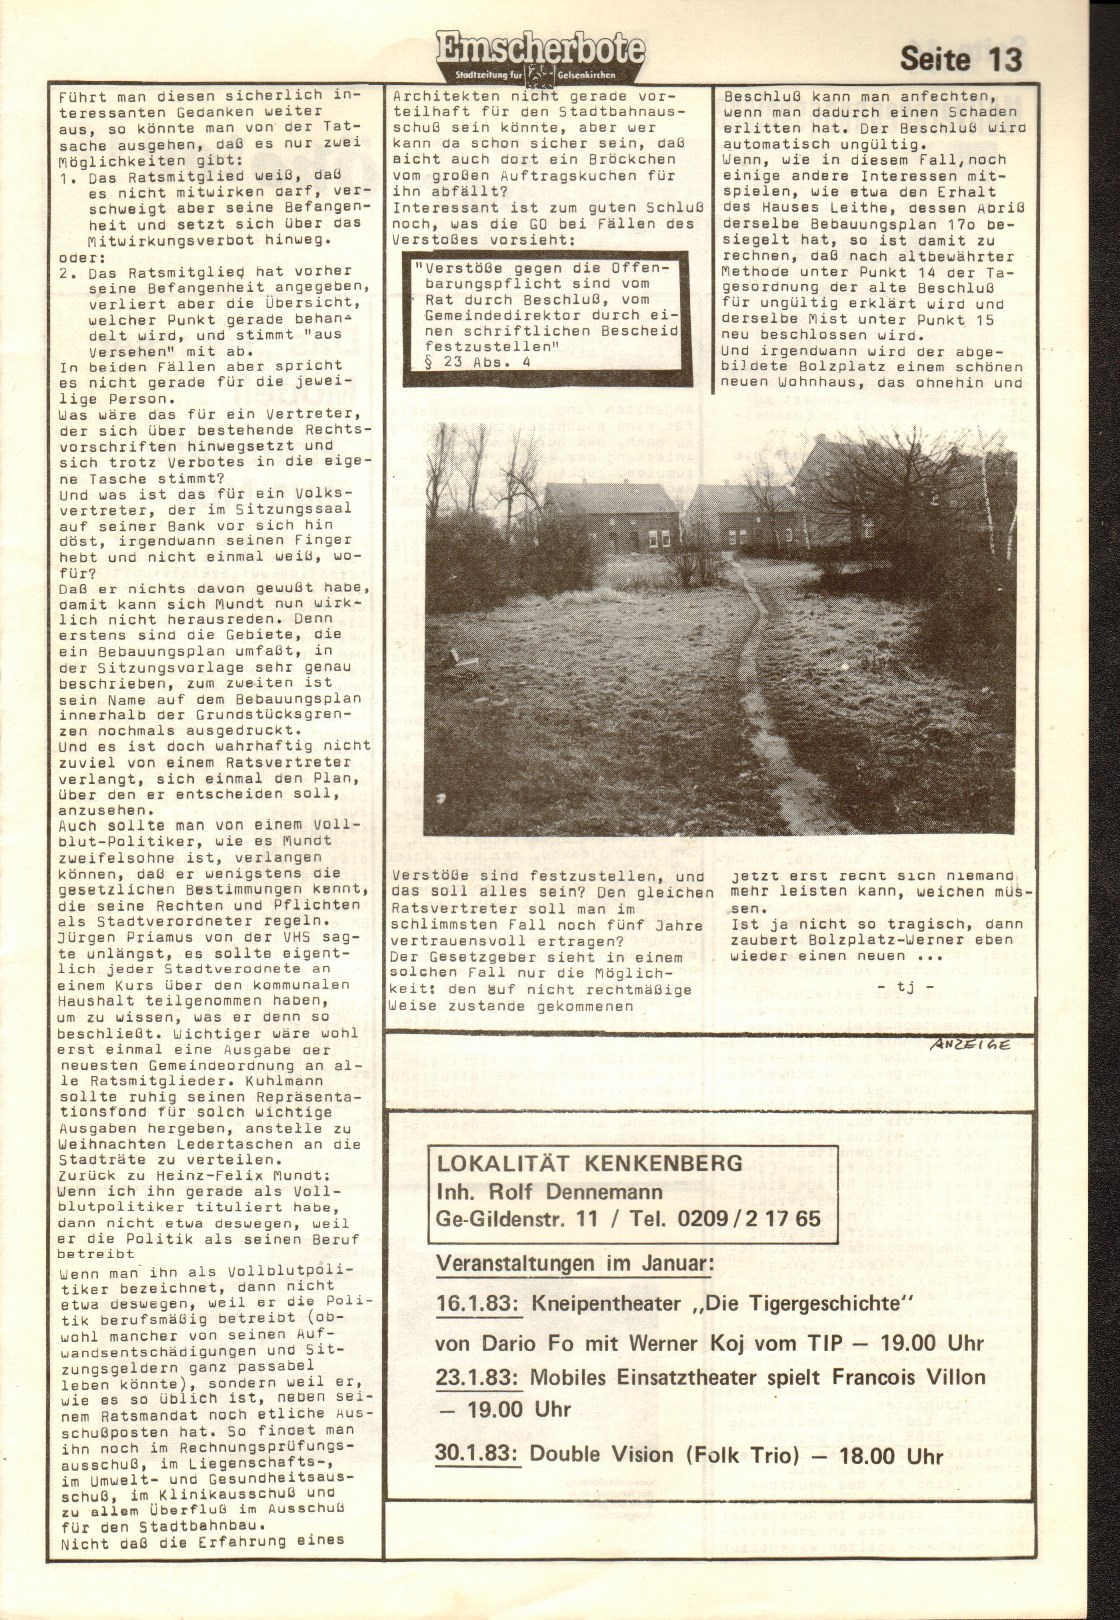 Gelsenkirchen_Emscherbote_1983_24_13